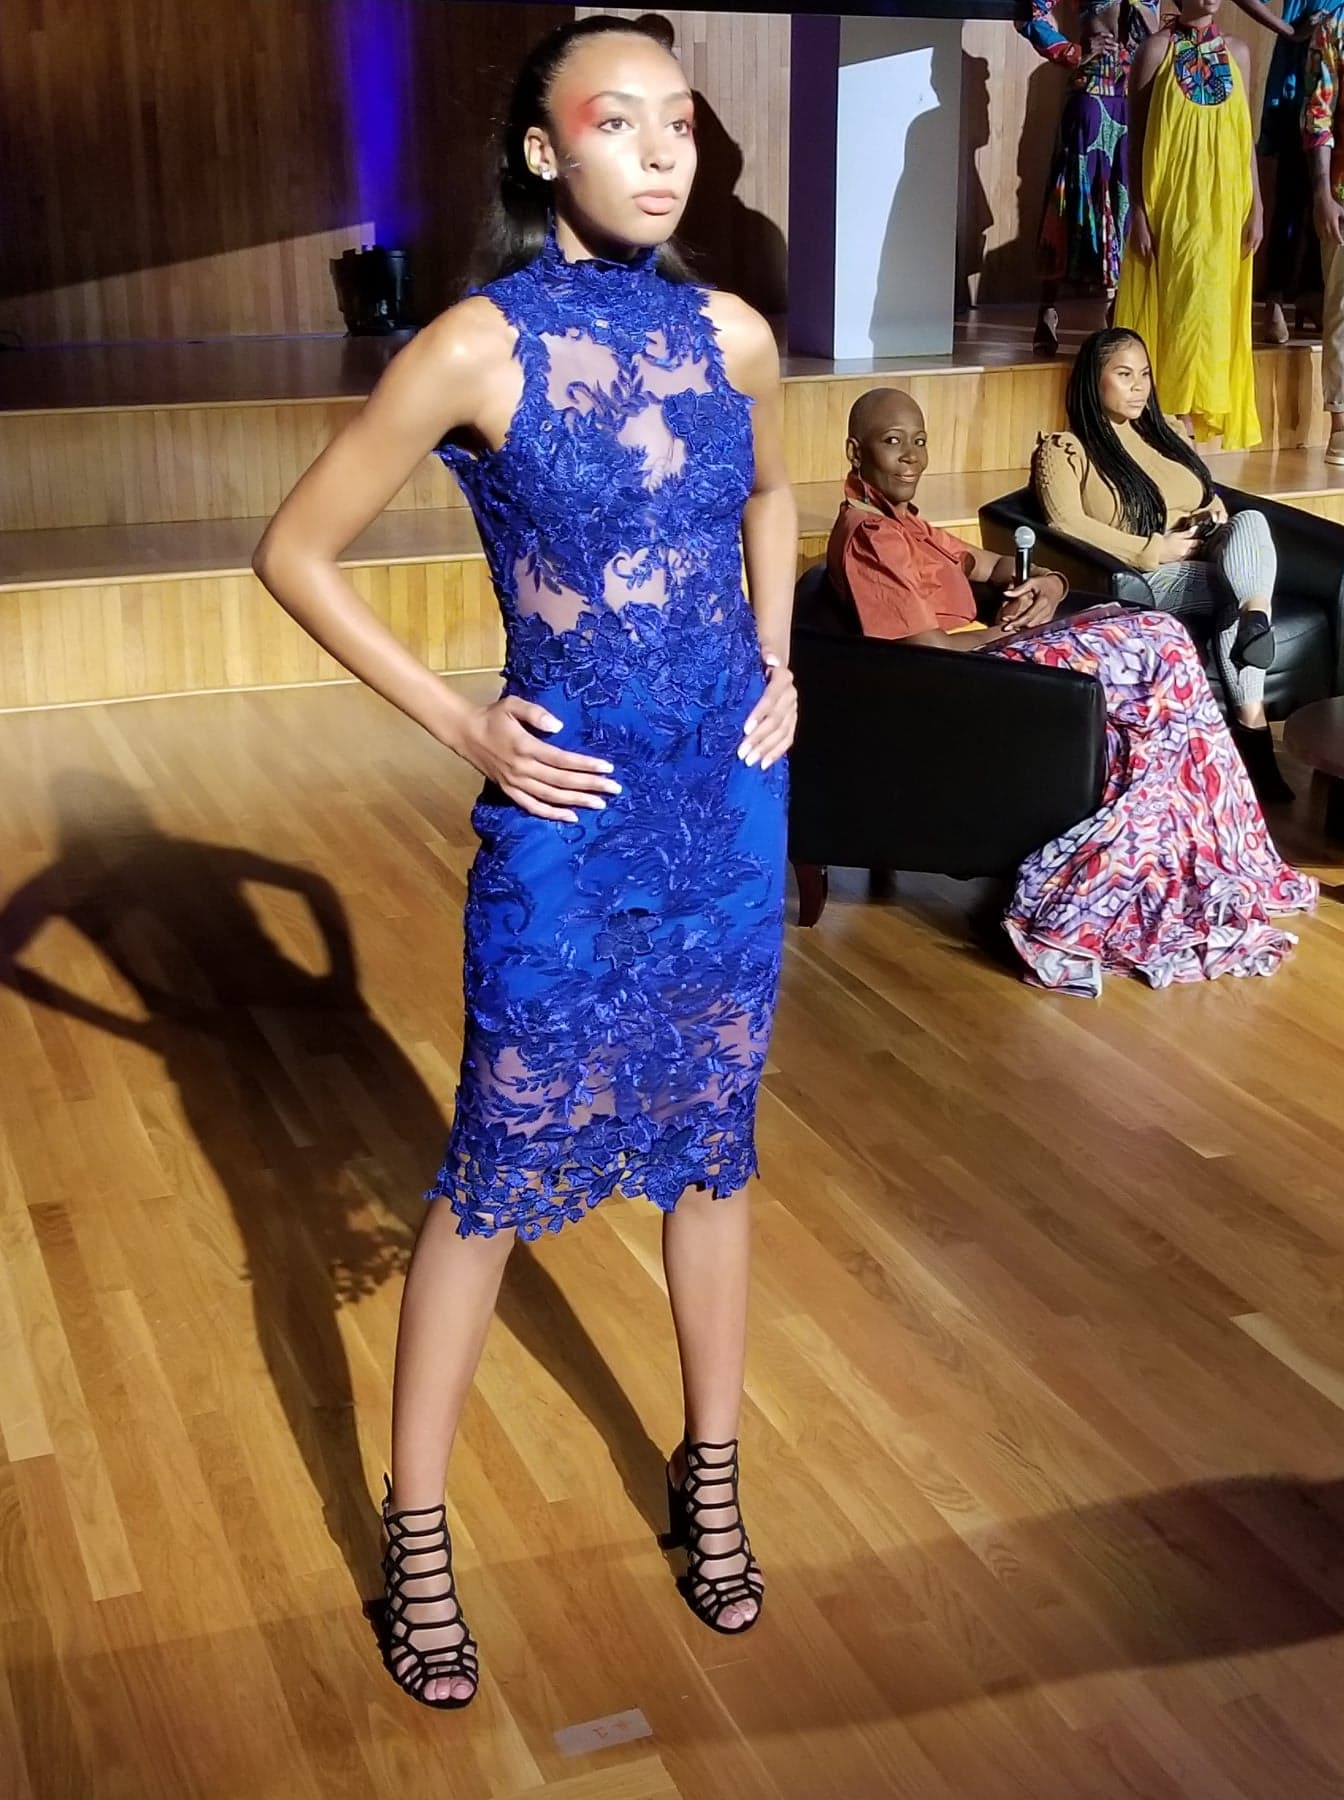 Royal Blue lace dress by Claudia Pegus, photographer Stephen Doobal